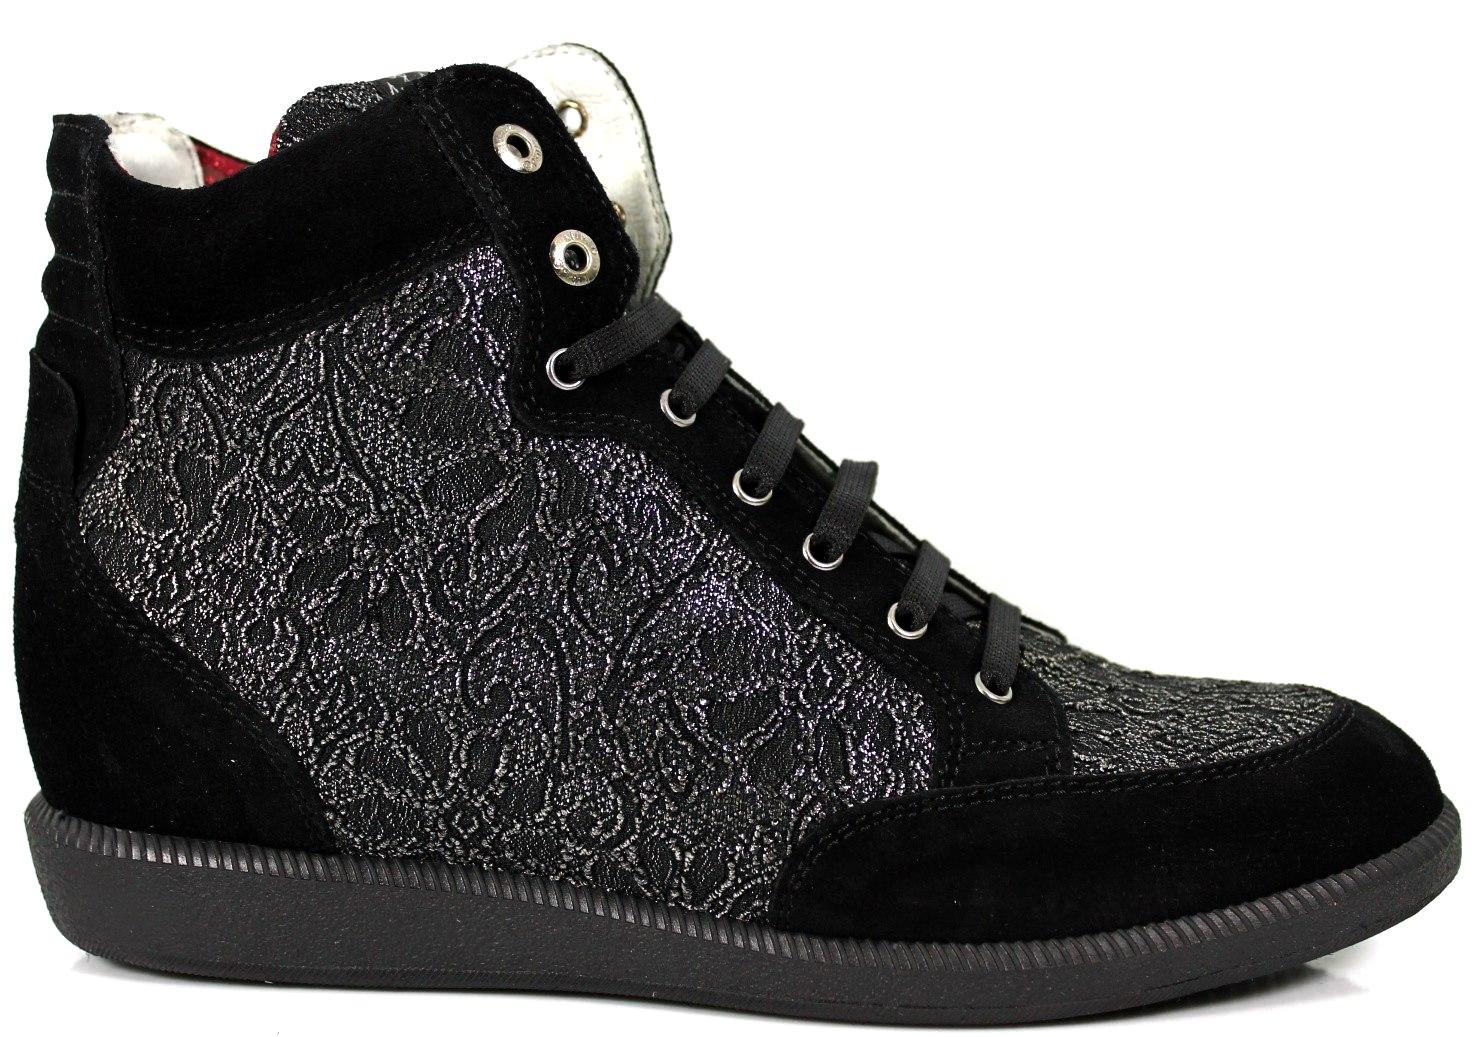 Calzature Liu Bambina Jo Scarpe Sneakers Woman Ub20839 Donna Con vHIwrHqF 376974d8914